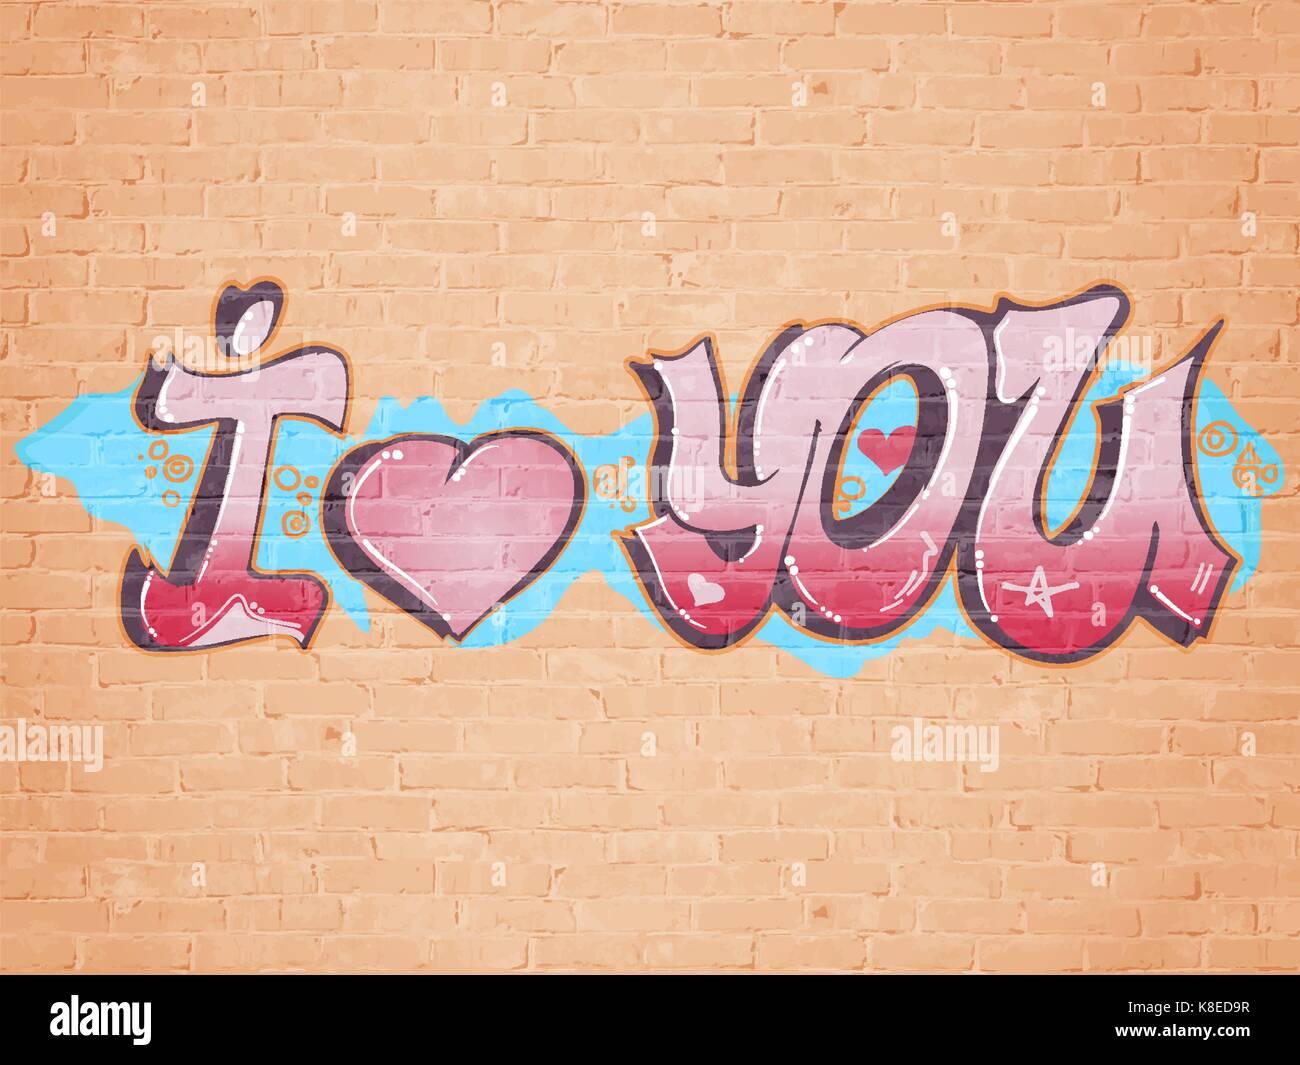 I love you graffiti style stock vector